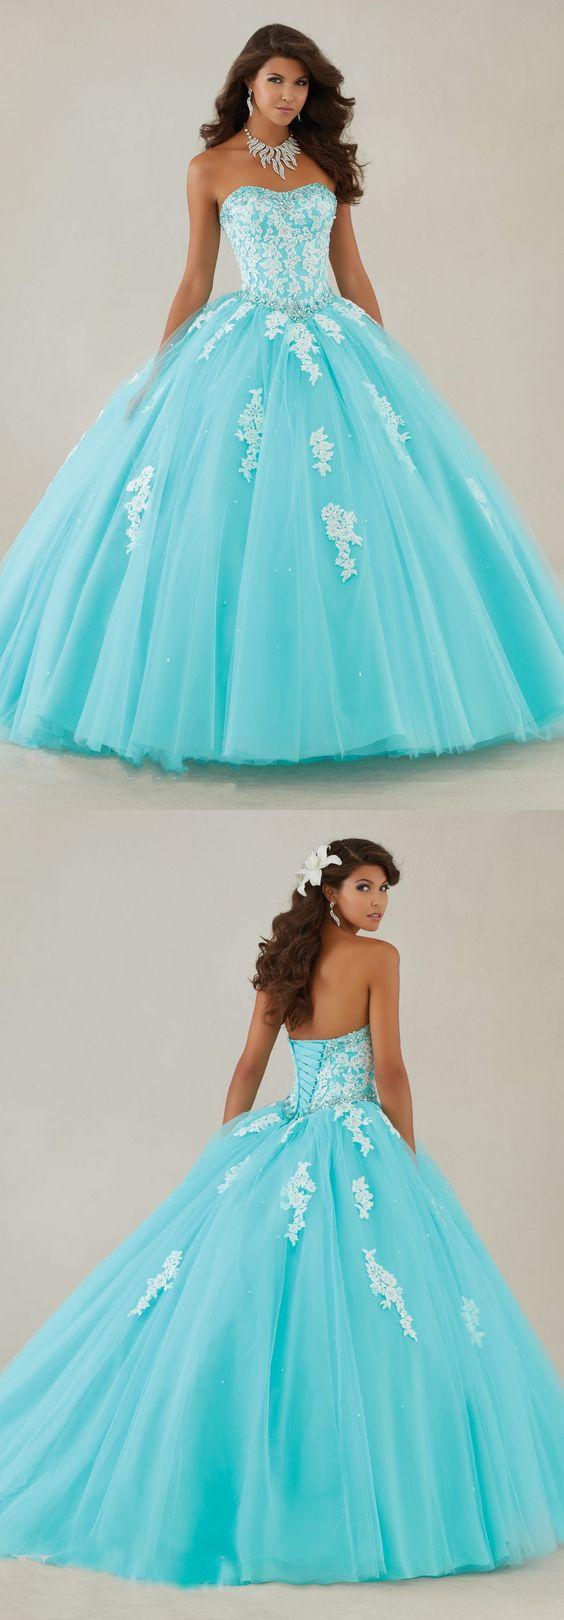 Blue Quinceanera Dresses,Ball Gown Dress,Appliques Quinceanera Dresses,Sweet 16 Dress,